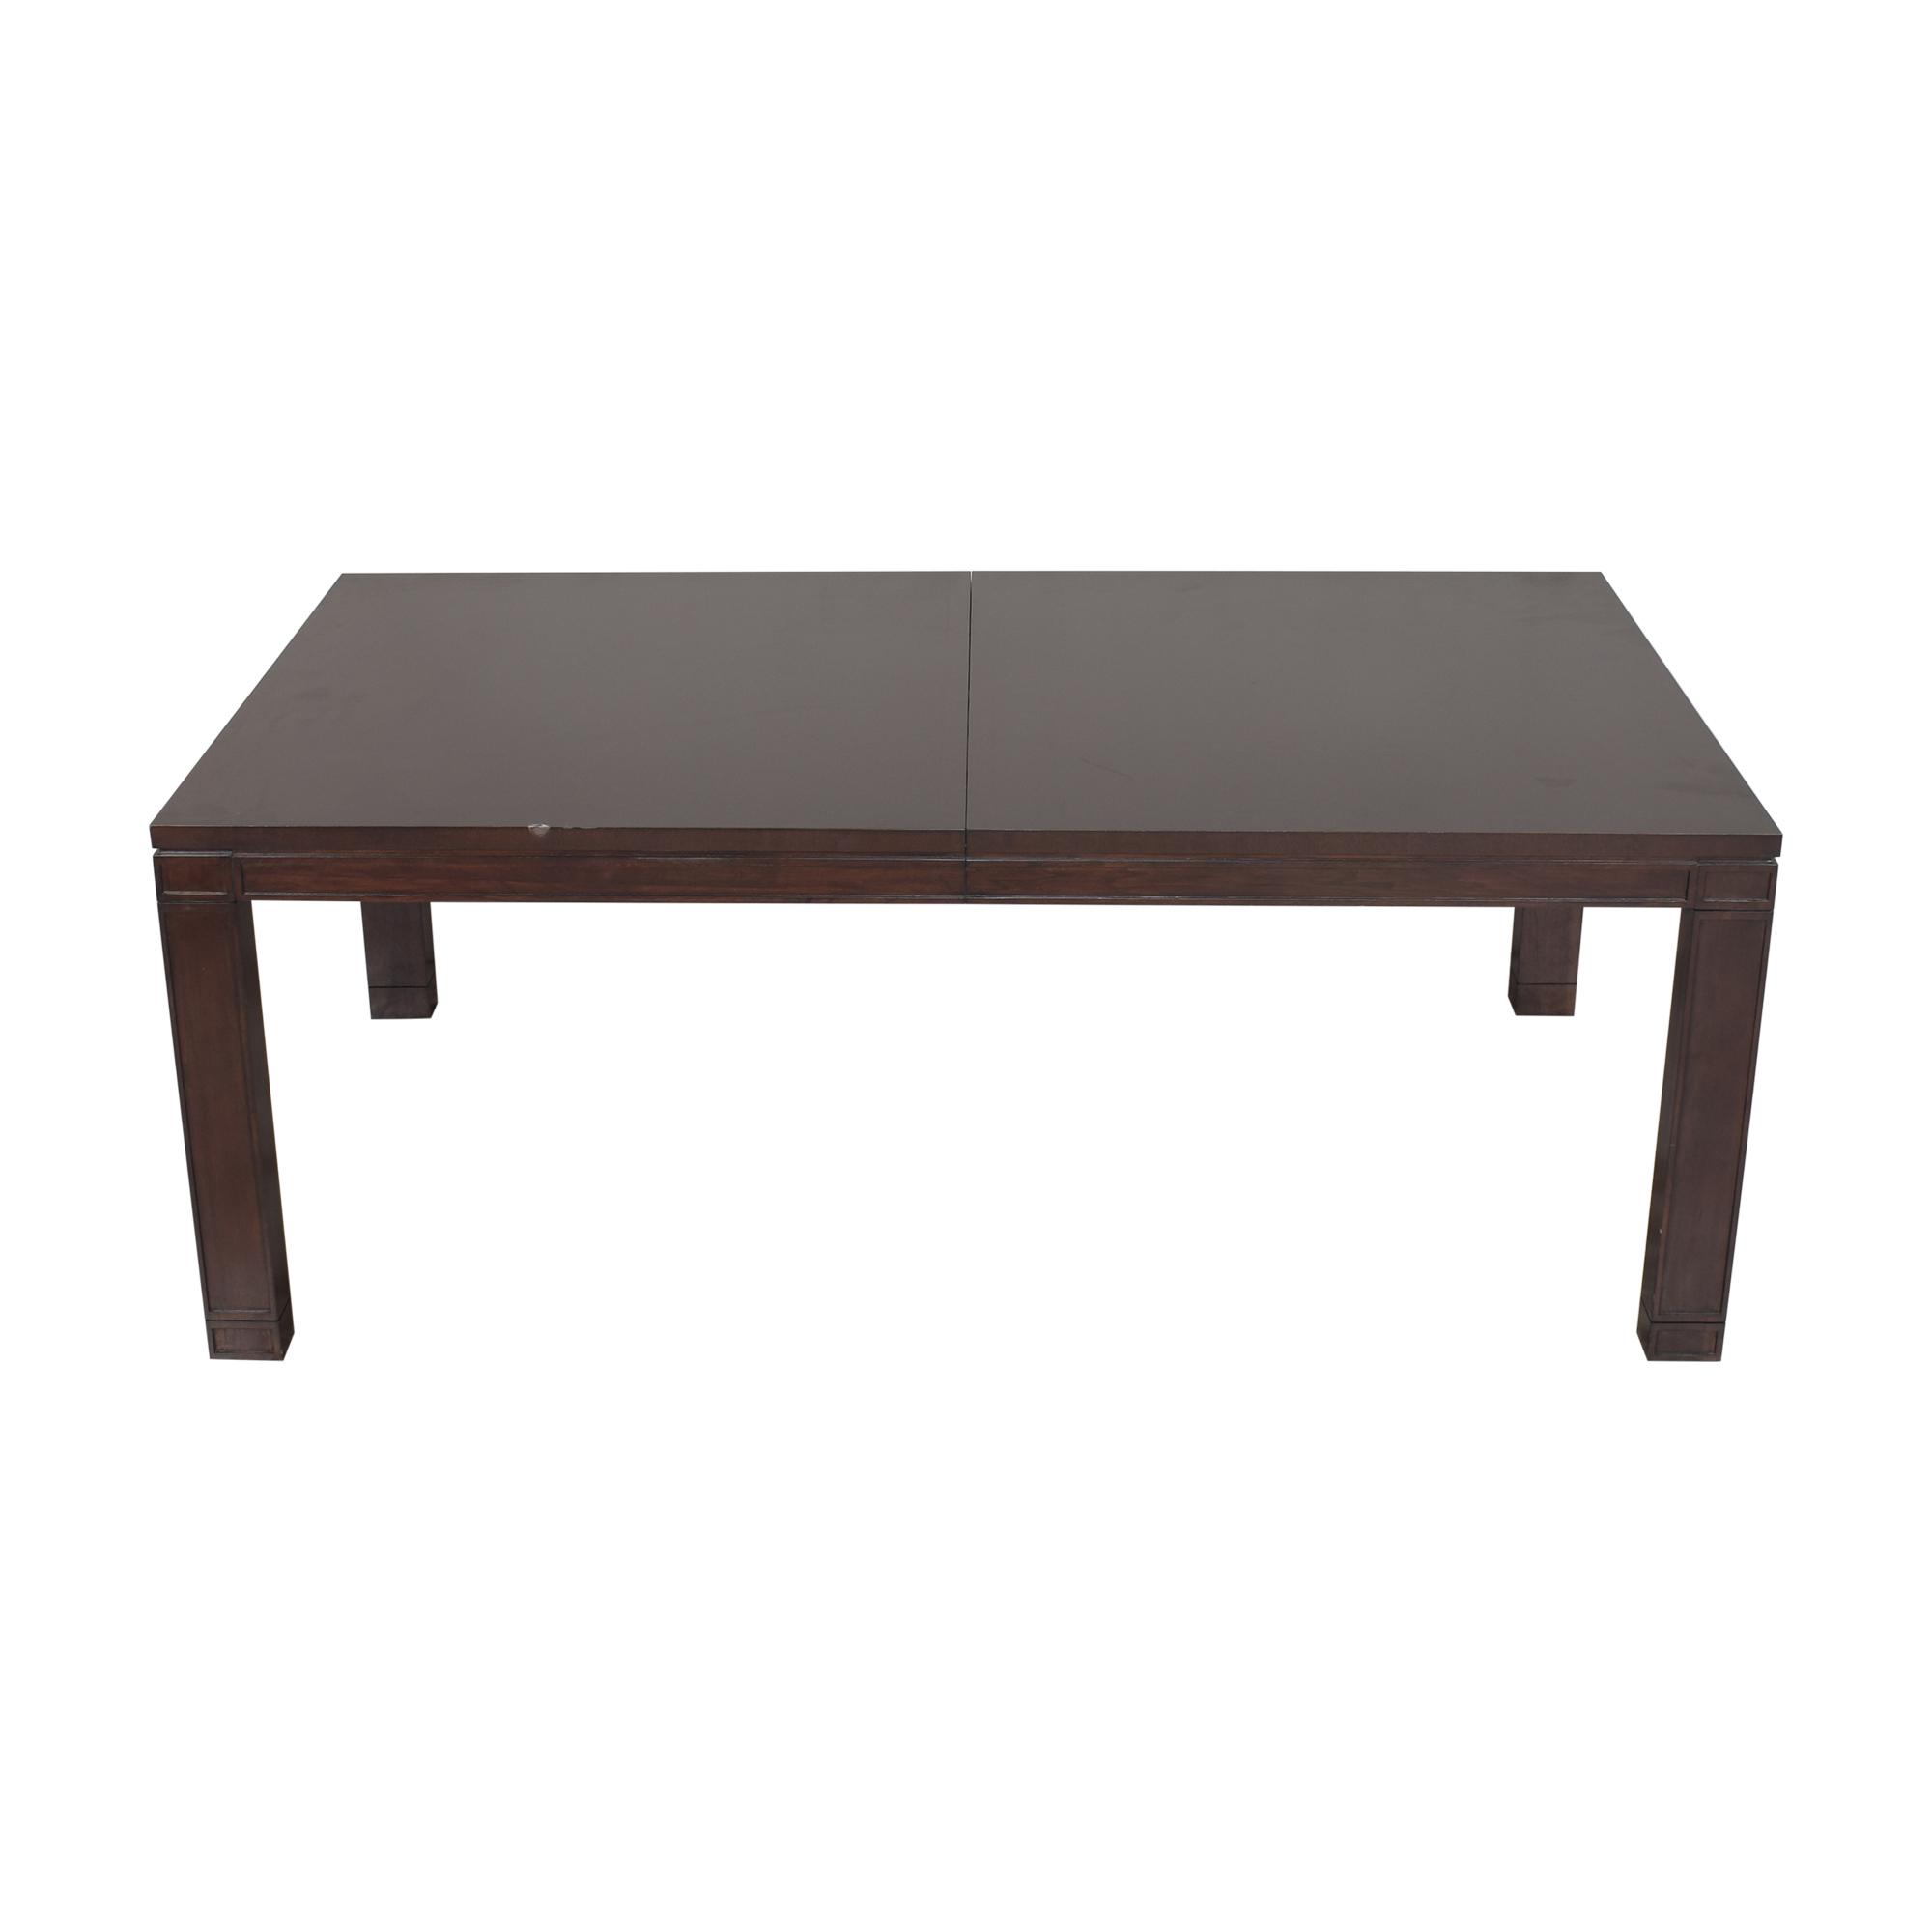 Vanguard Furniture Vanguard Furniture Extendable Dining Table nj